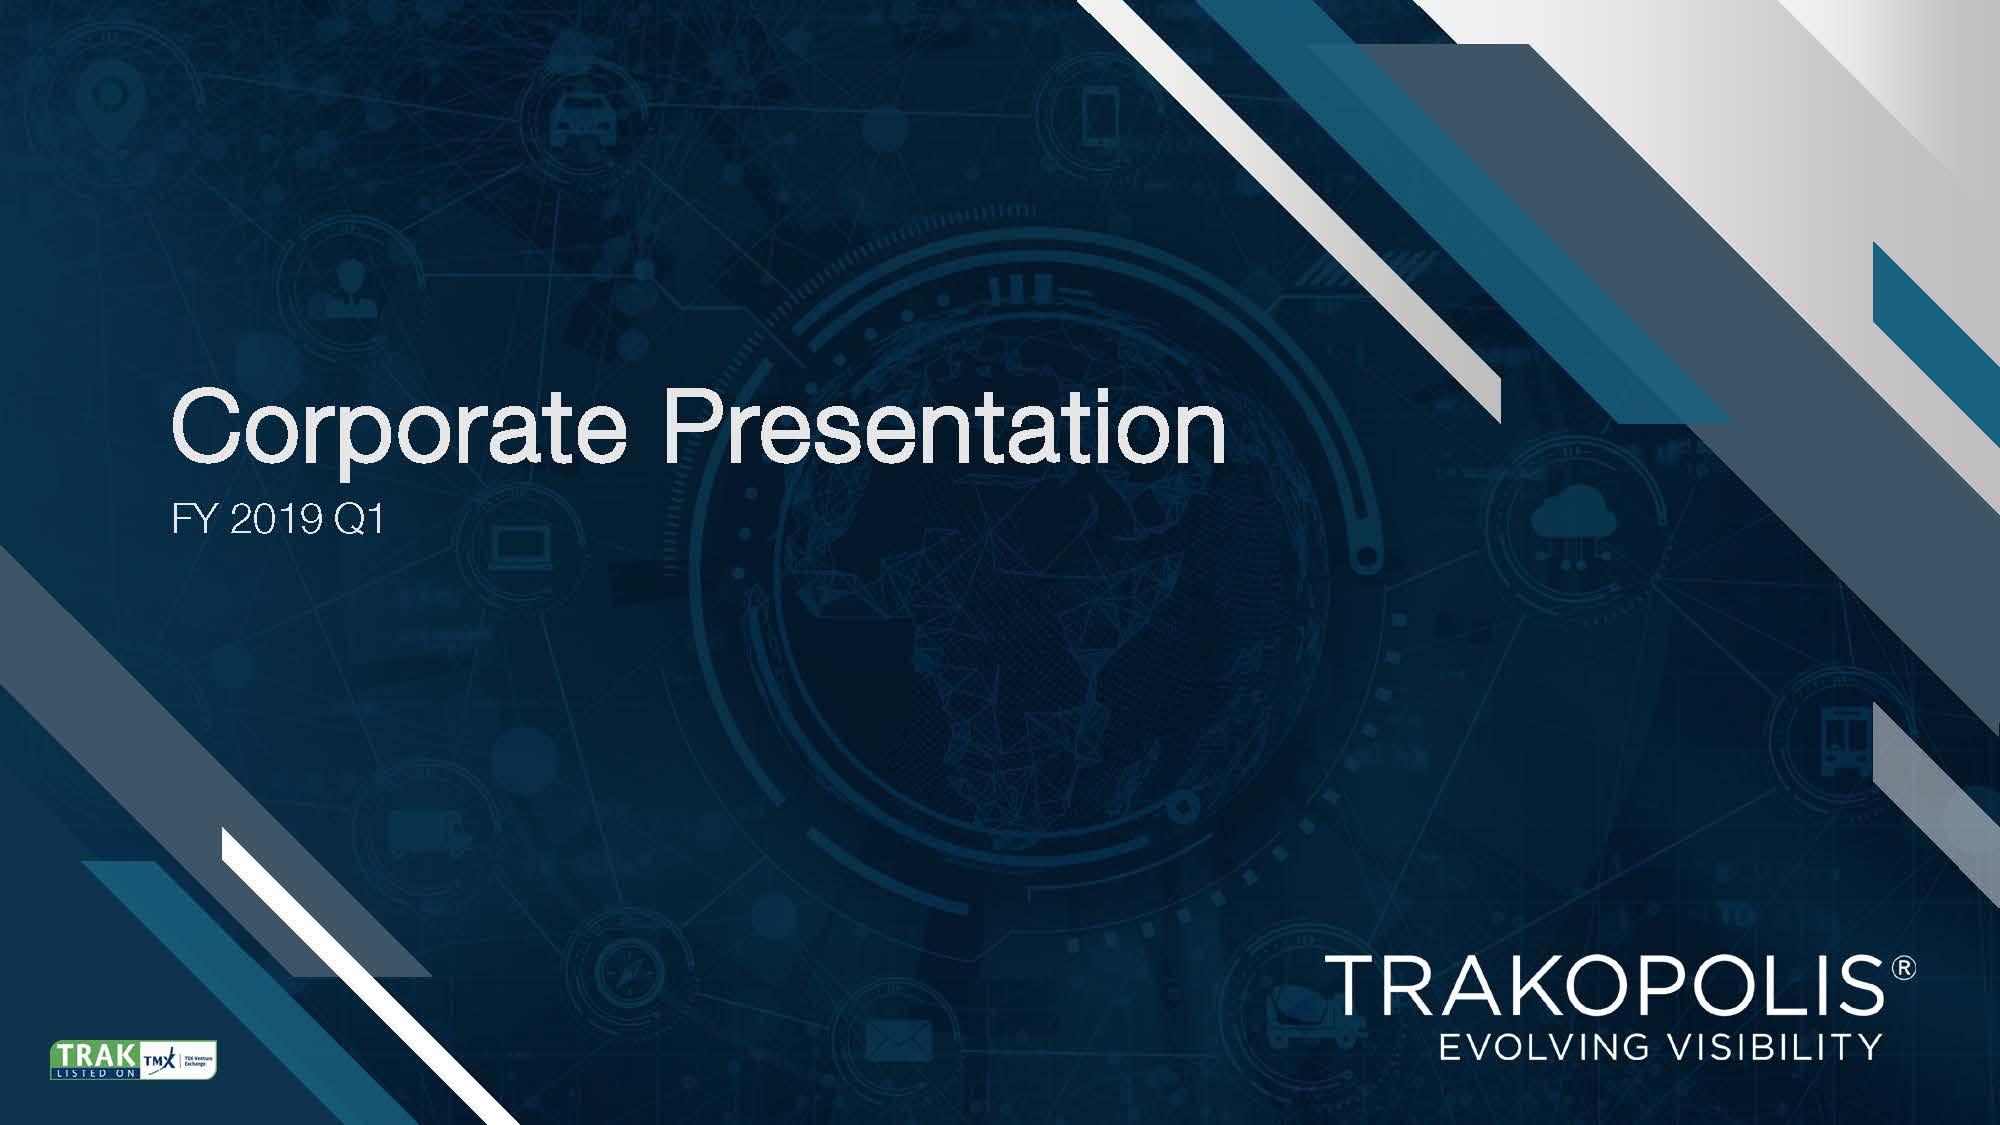 TRAK_CorporatePresentation_2019_Q1_web_Page_01.jpg